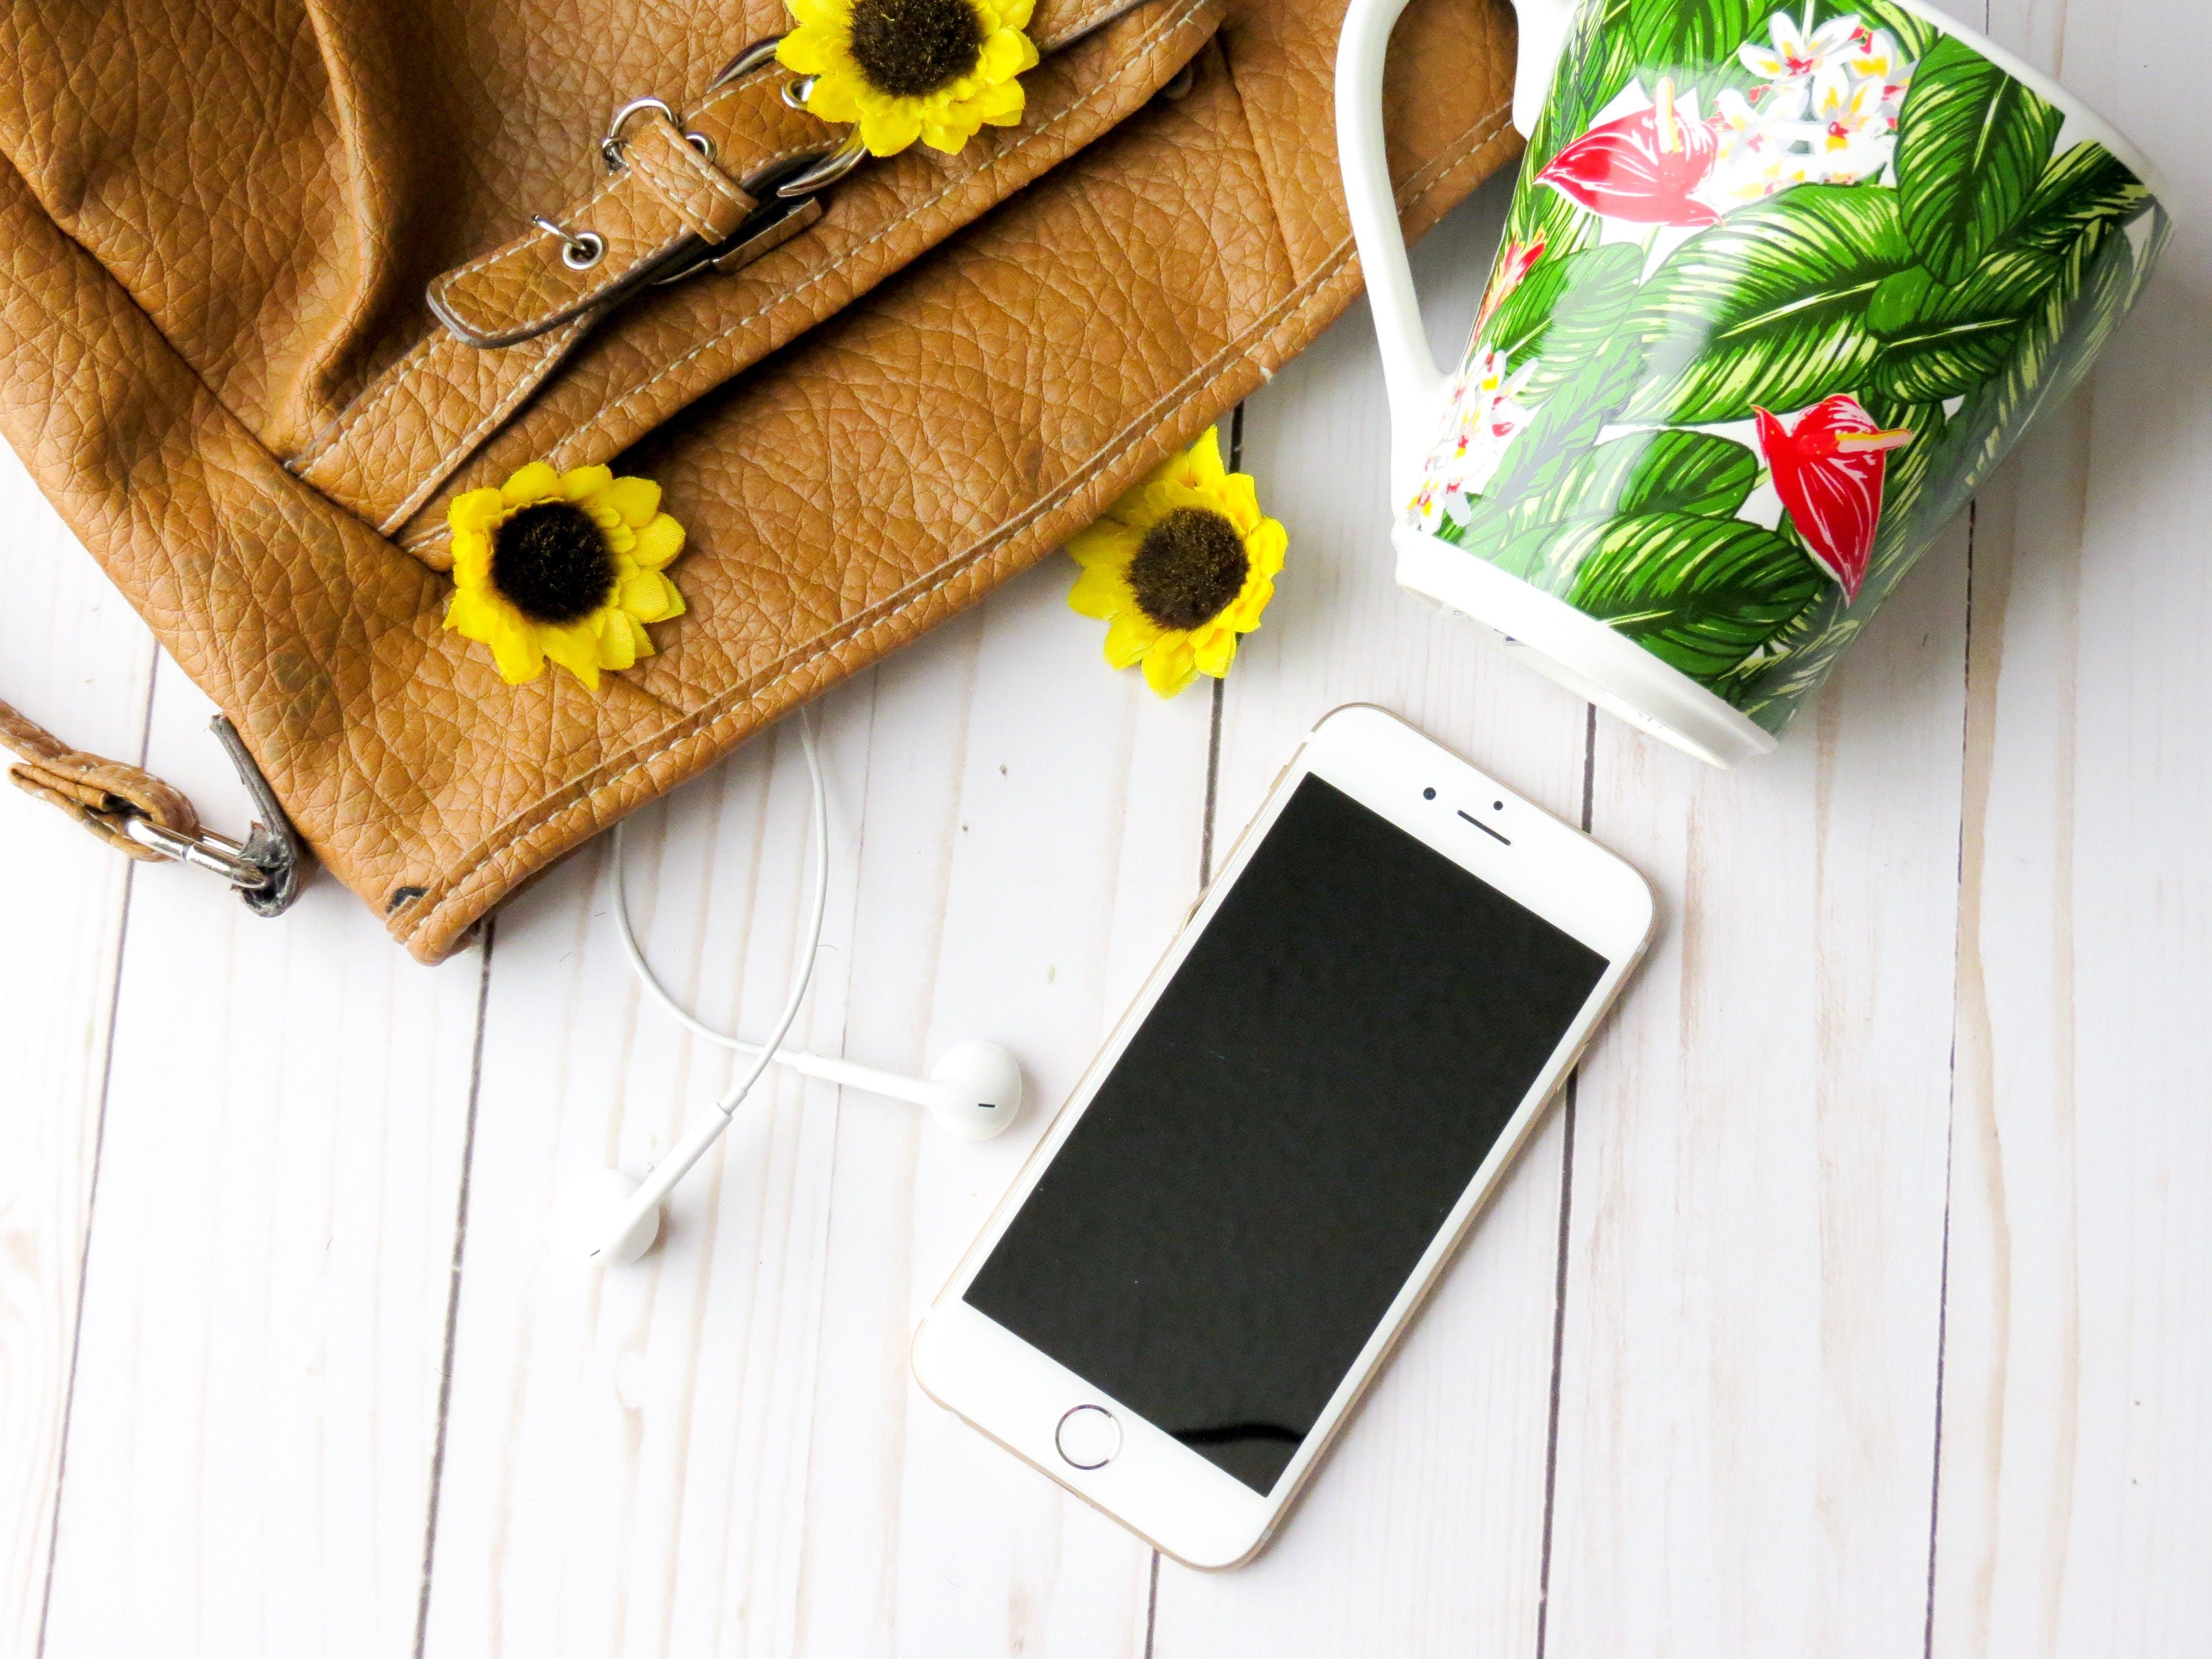 background, bag, beautiful flowers